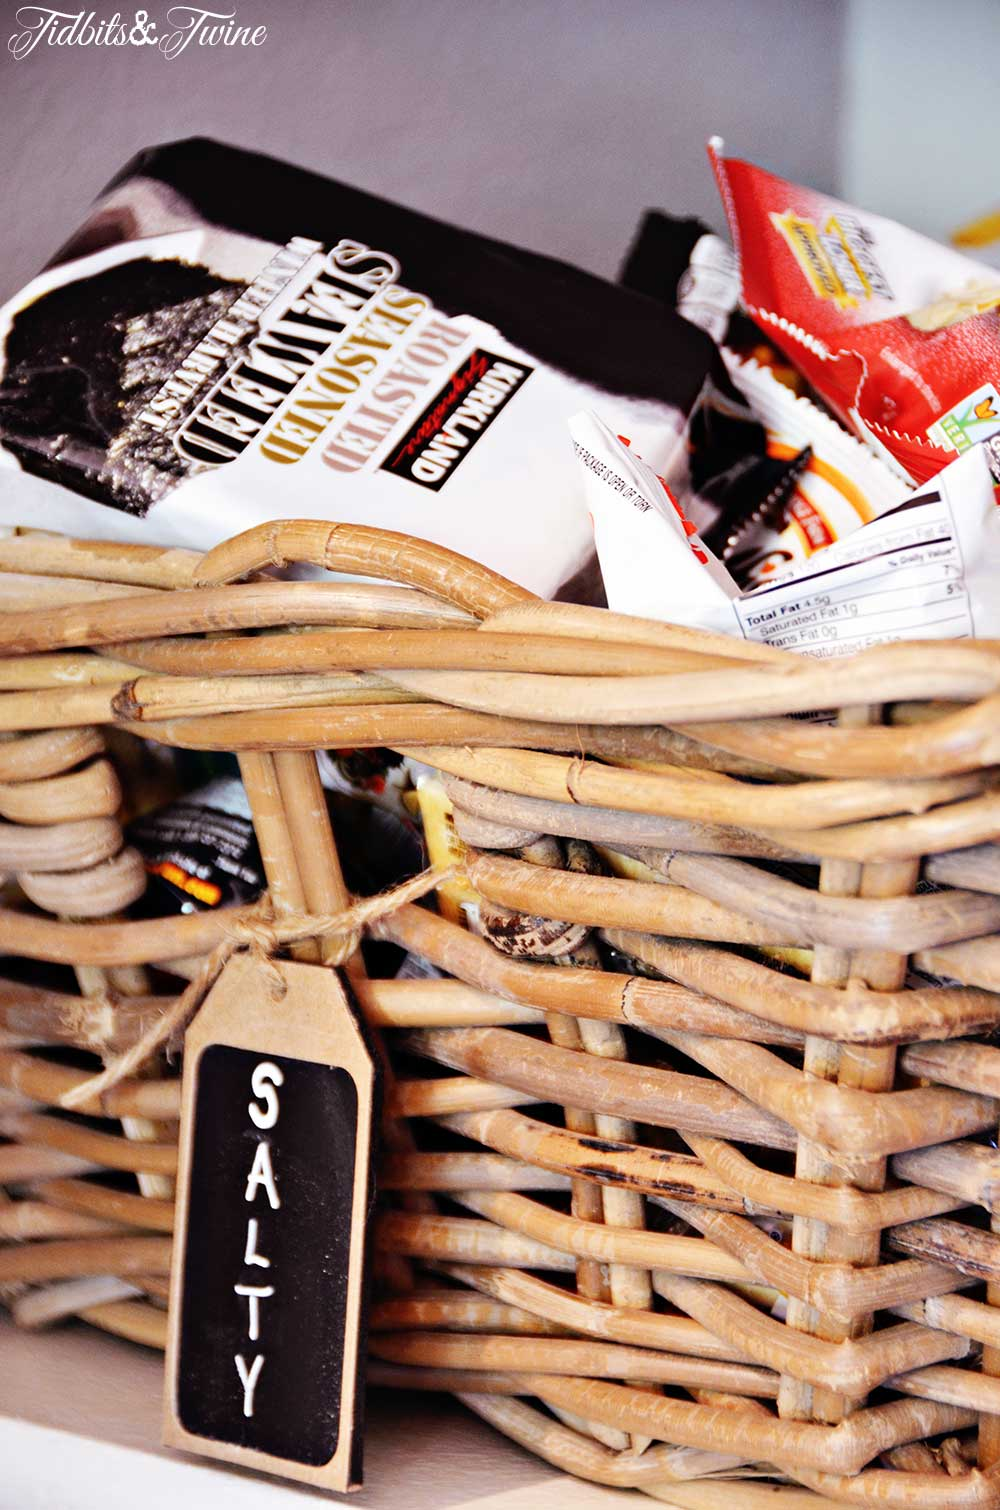 TIDBITS&TWINE Pantry Makeover Storage Baskets